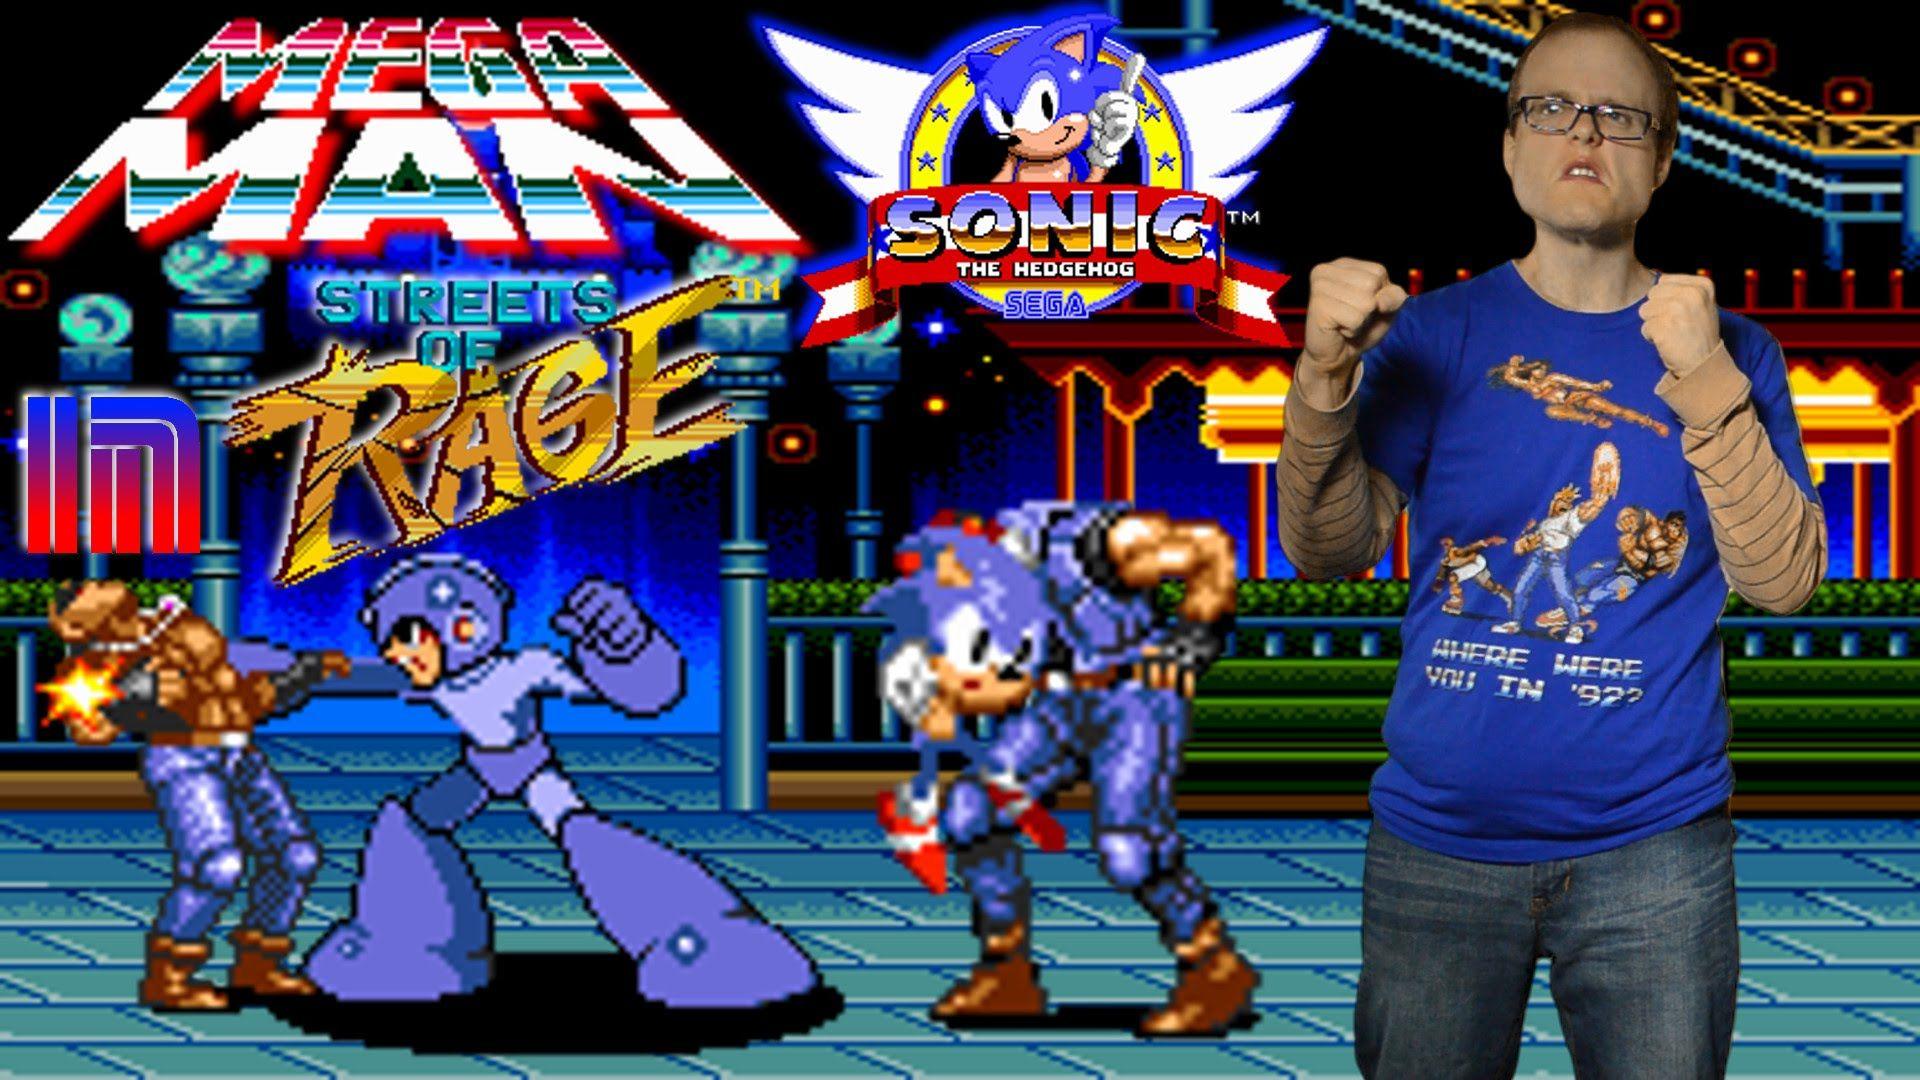 Mega Man & Sonic The Hedgehog in Streets of Rage ROM Hacks